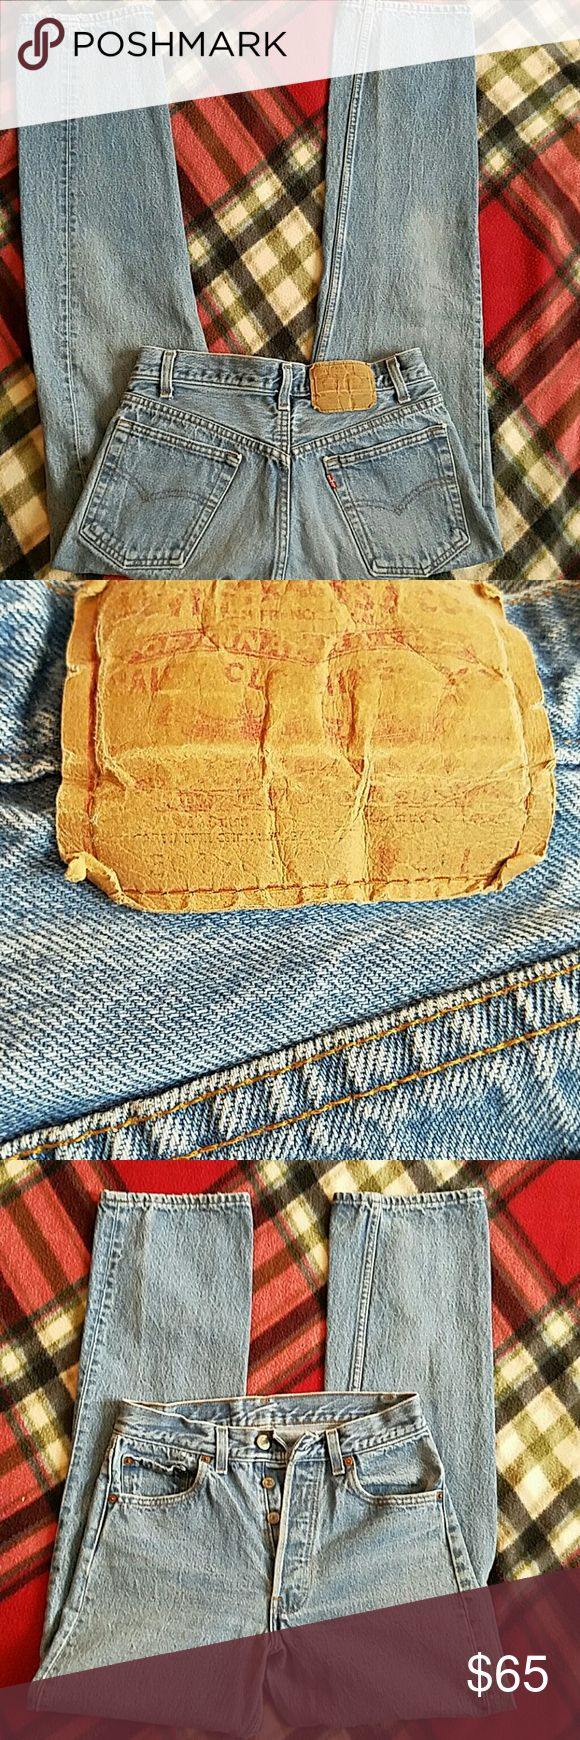 BOTTOM PRICE~VINTAGE LEVI'S 501 BUTTONFLY JEANS VINTAGE LEVI 501 BUTTONFLY JEANS  28/30 LEVI 501 Jeans